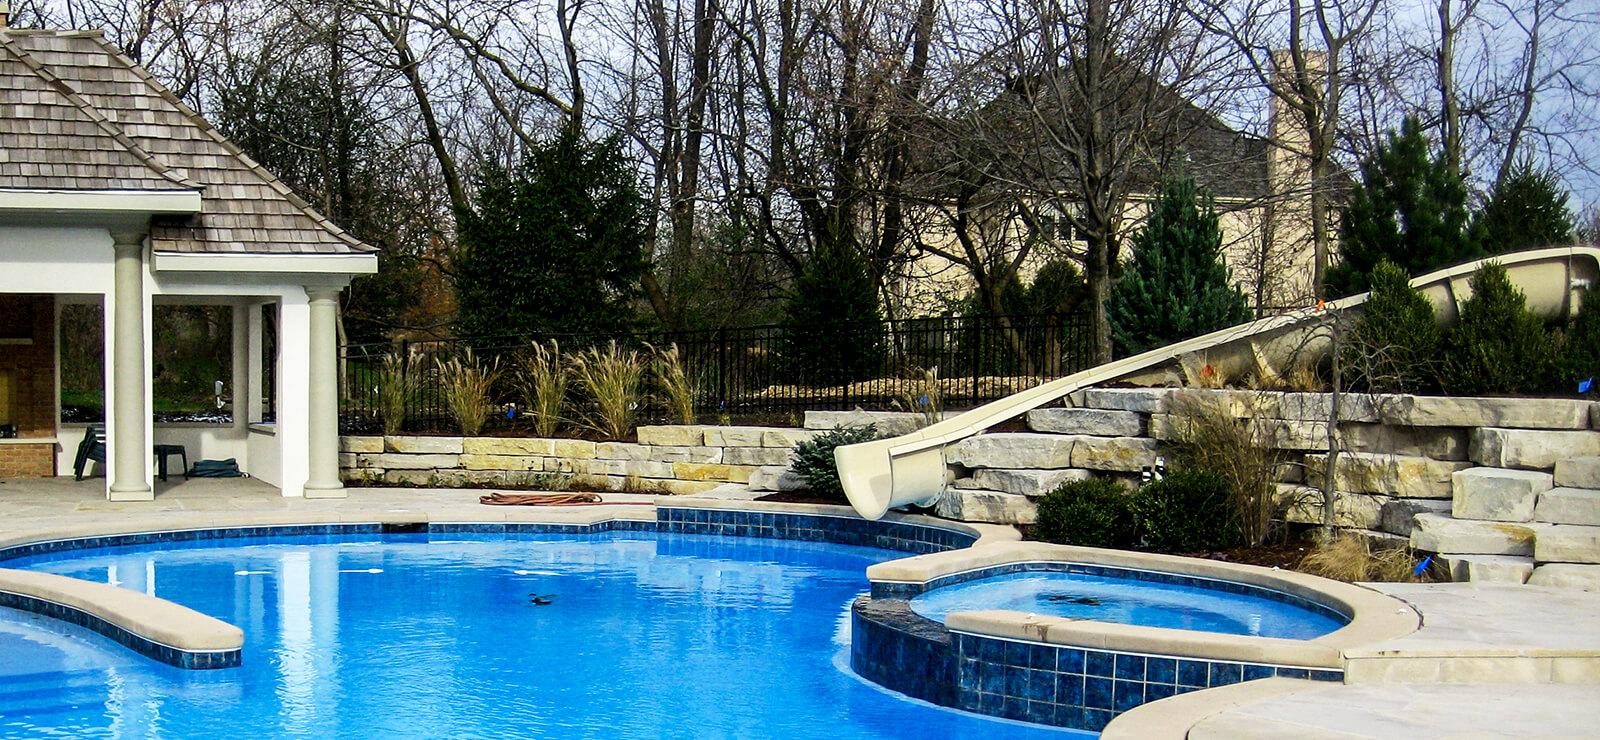 Mack Land Landscape Architects Wauconda Denver Hardscape with Pool